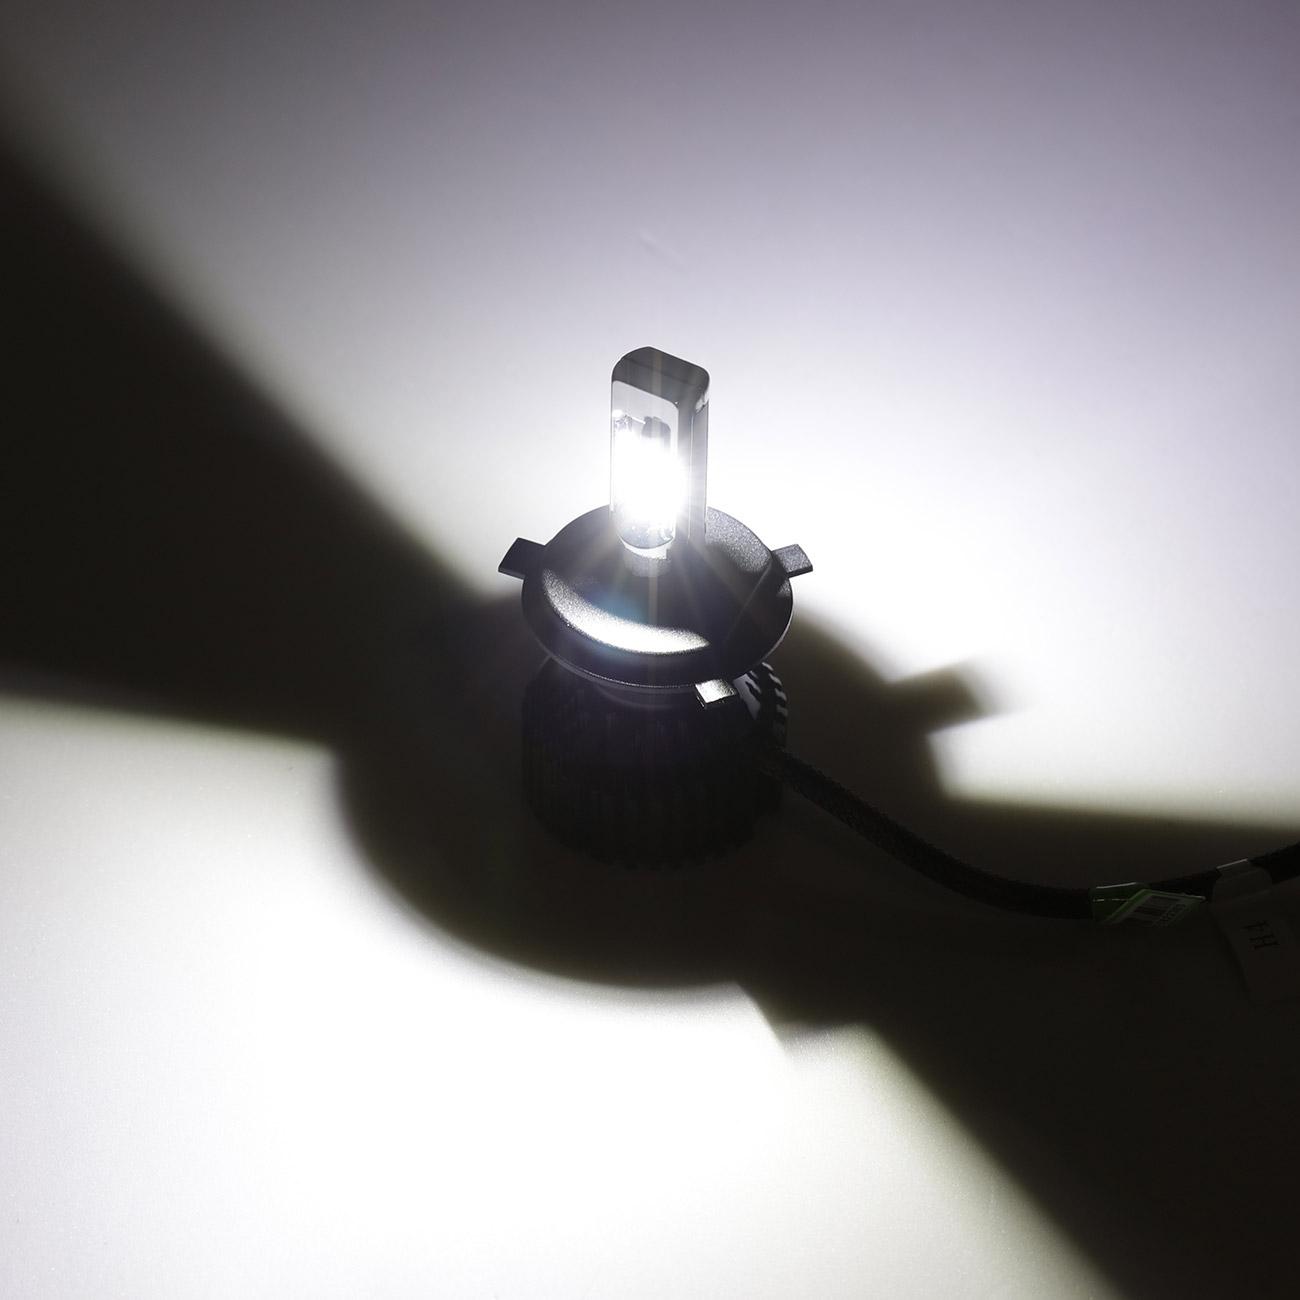 Oslamp T8 H4 H7 H11 9005 9006 Car Led Headlight Bulbs Zes Chips 60w Relay Wiring Diagram Show Case